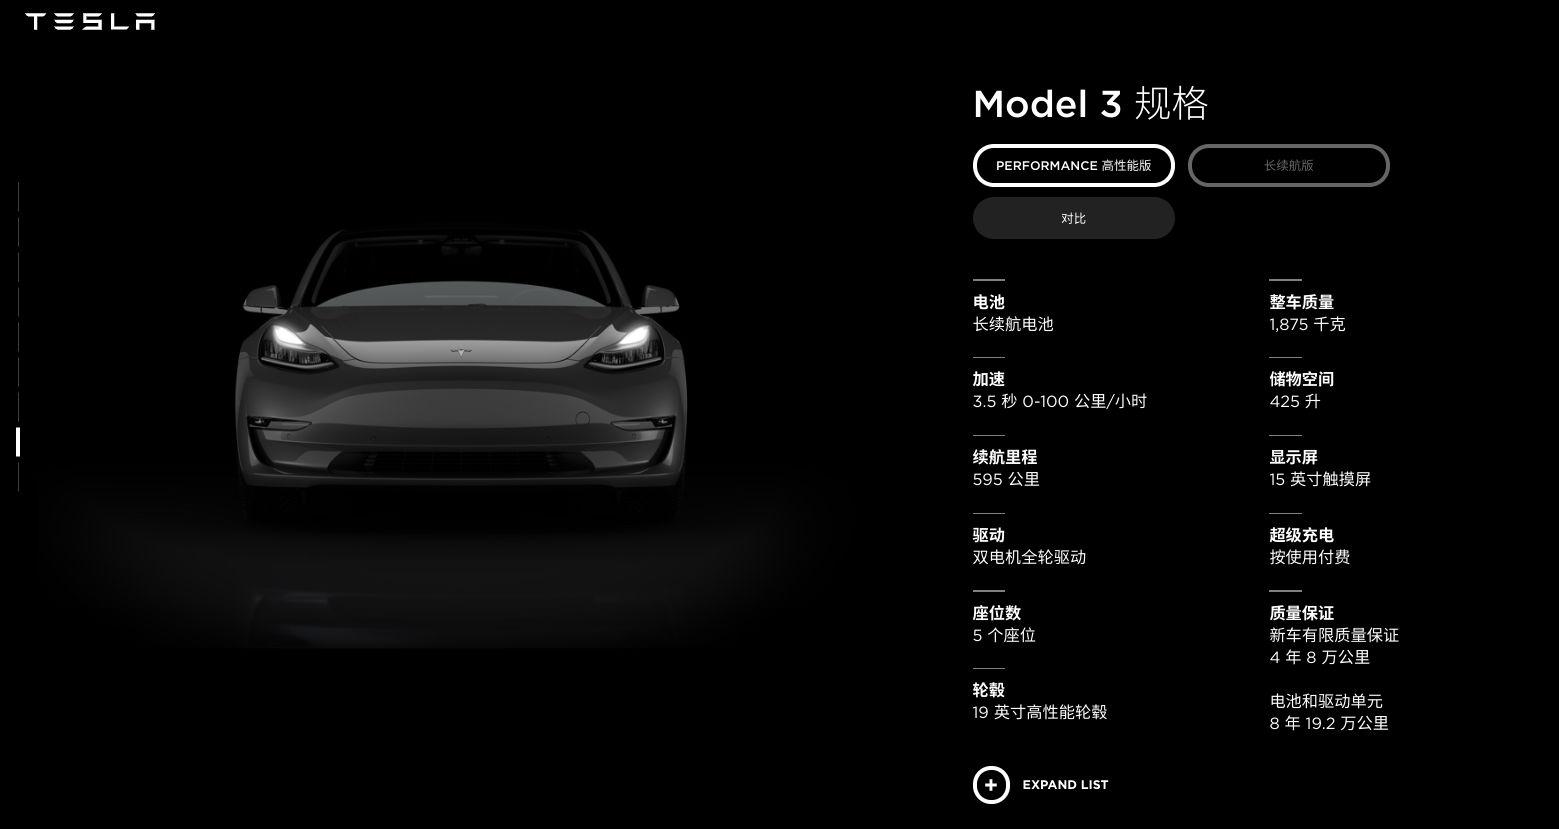 model-3-china-configurator-1